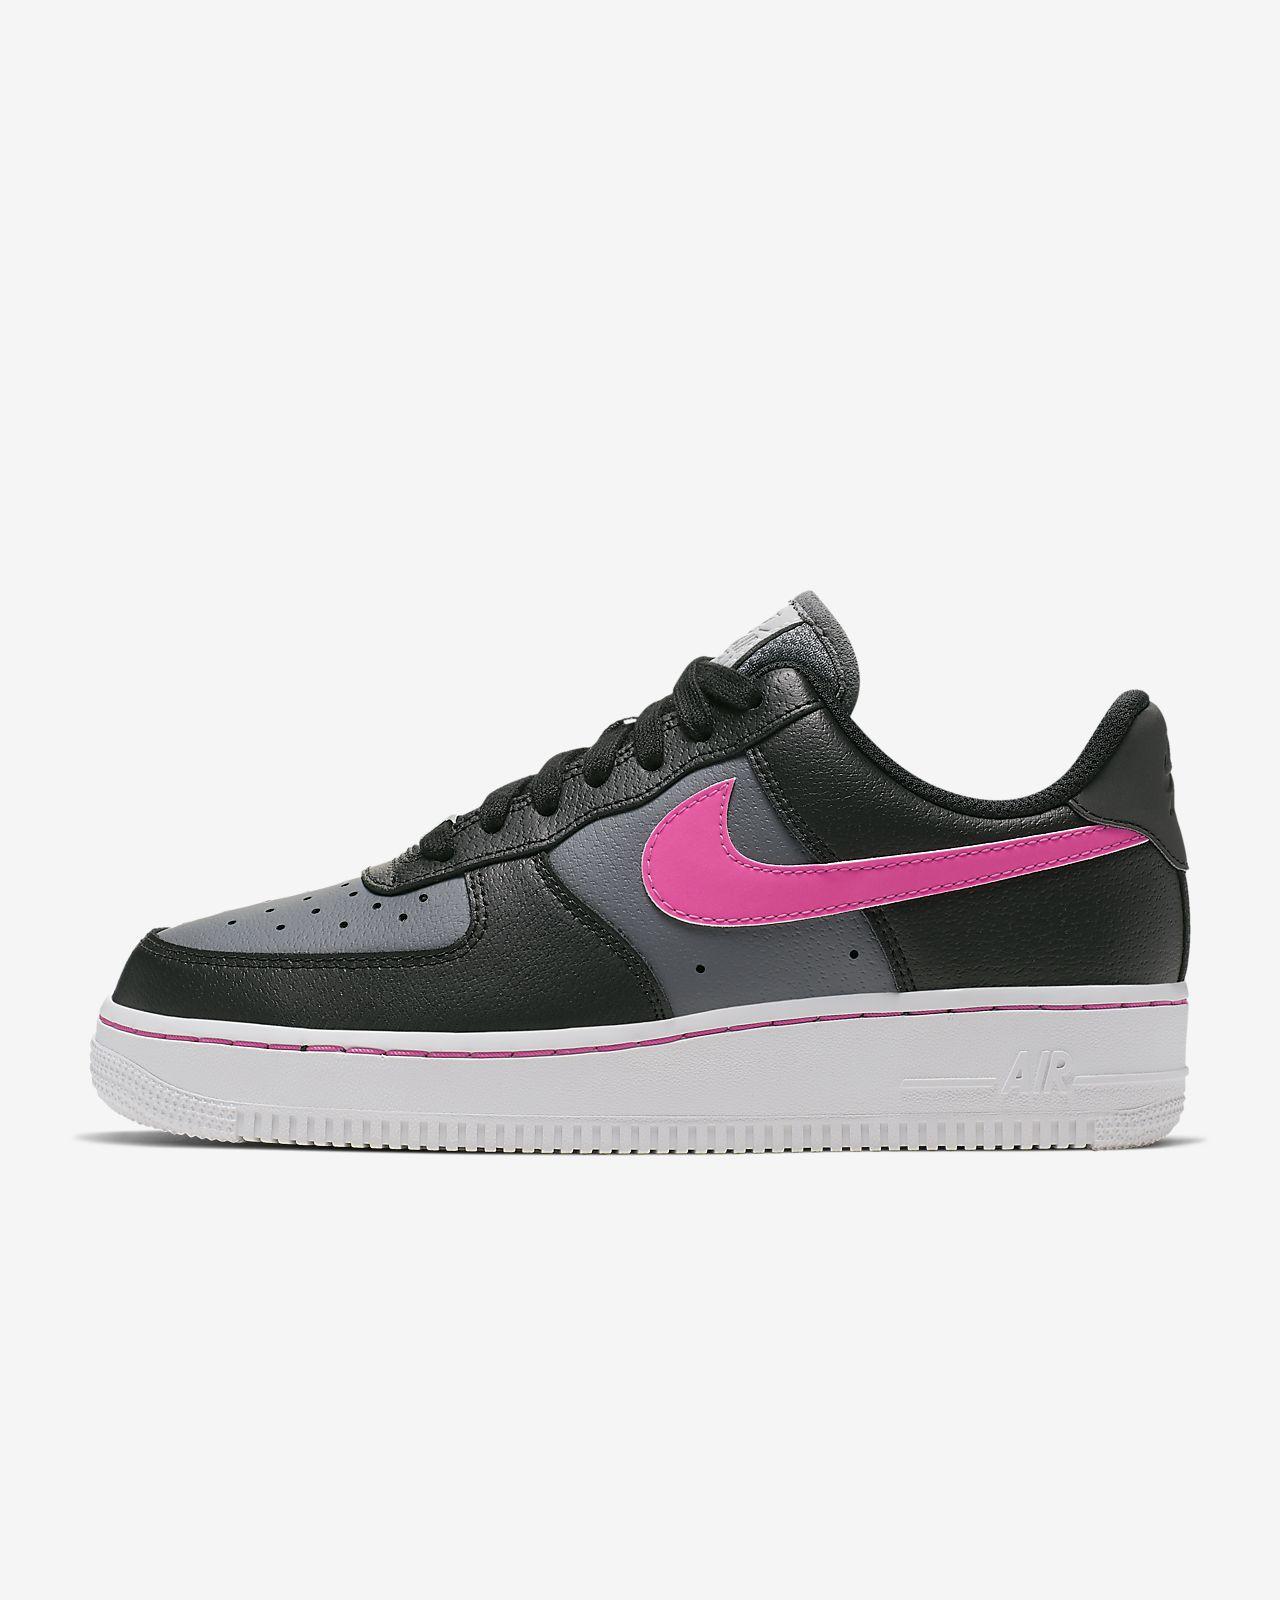 Calzado para mujer Nike Air Force 1 Low